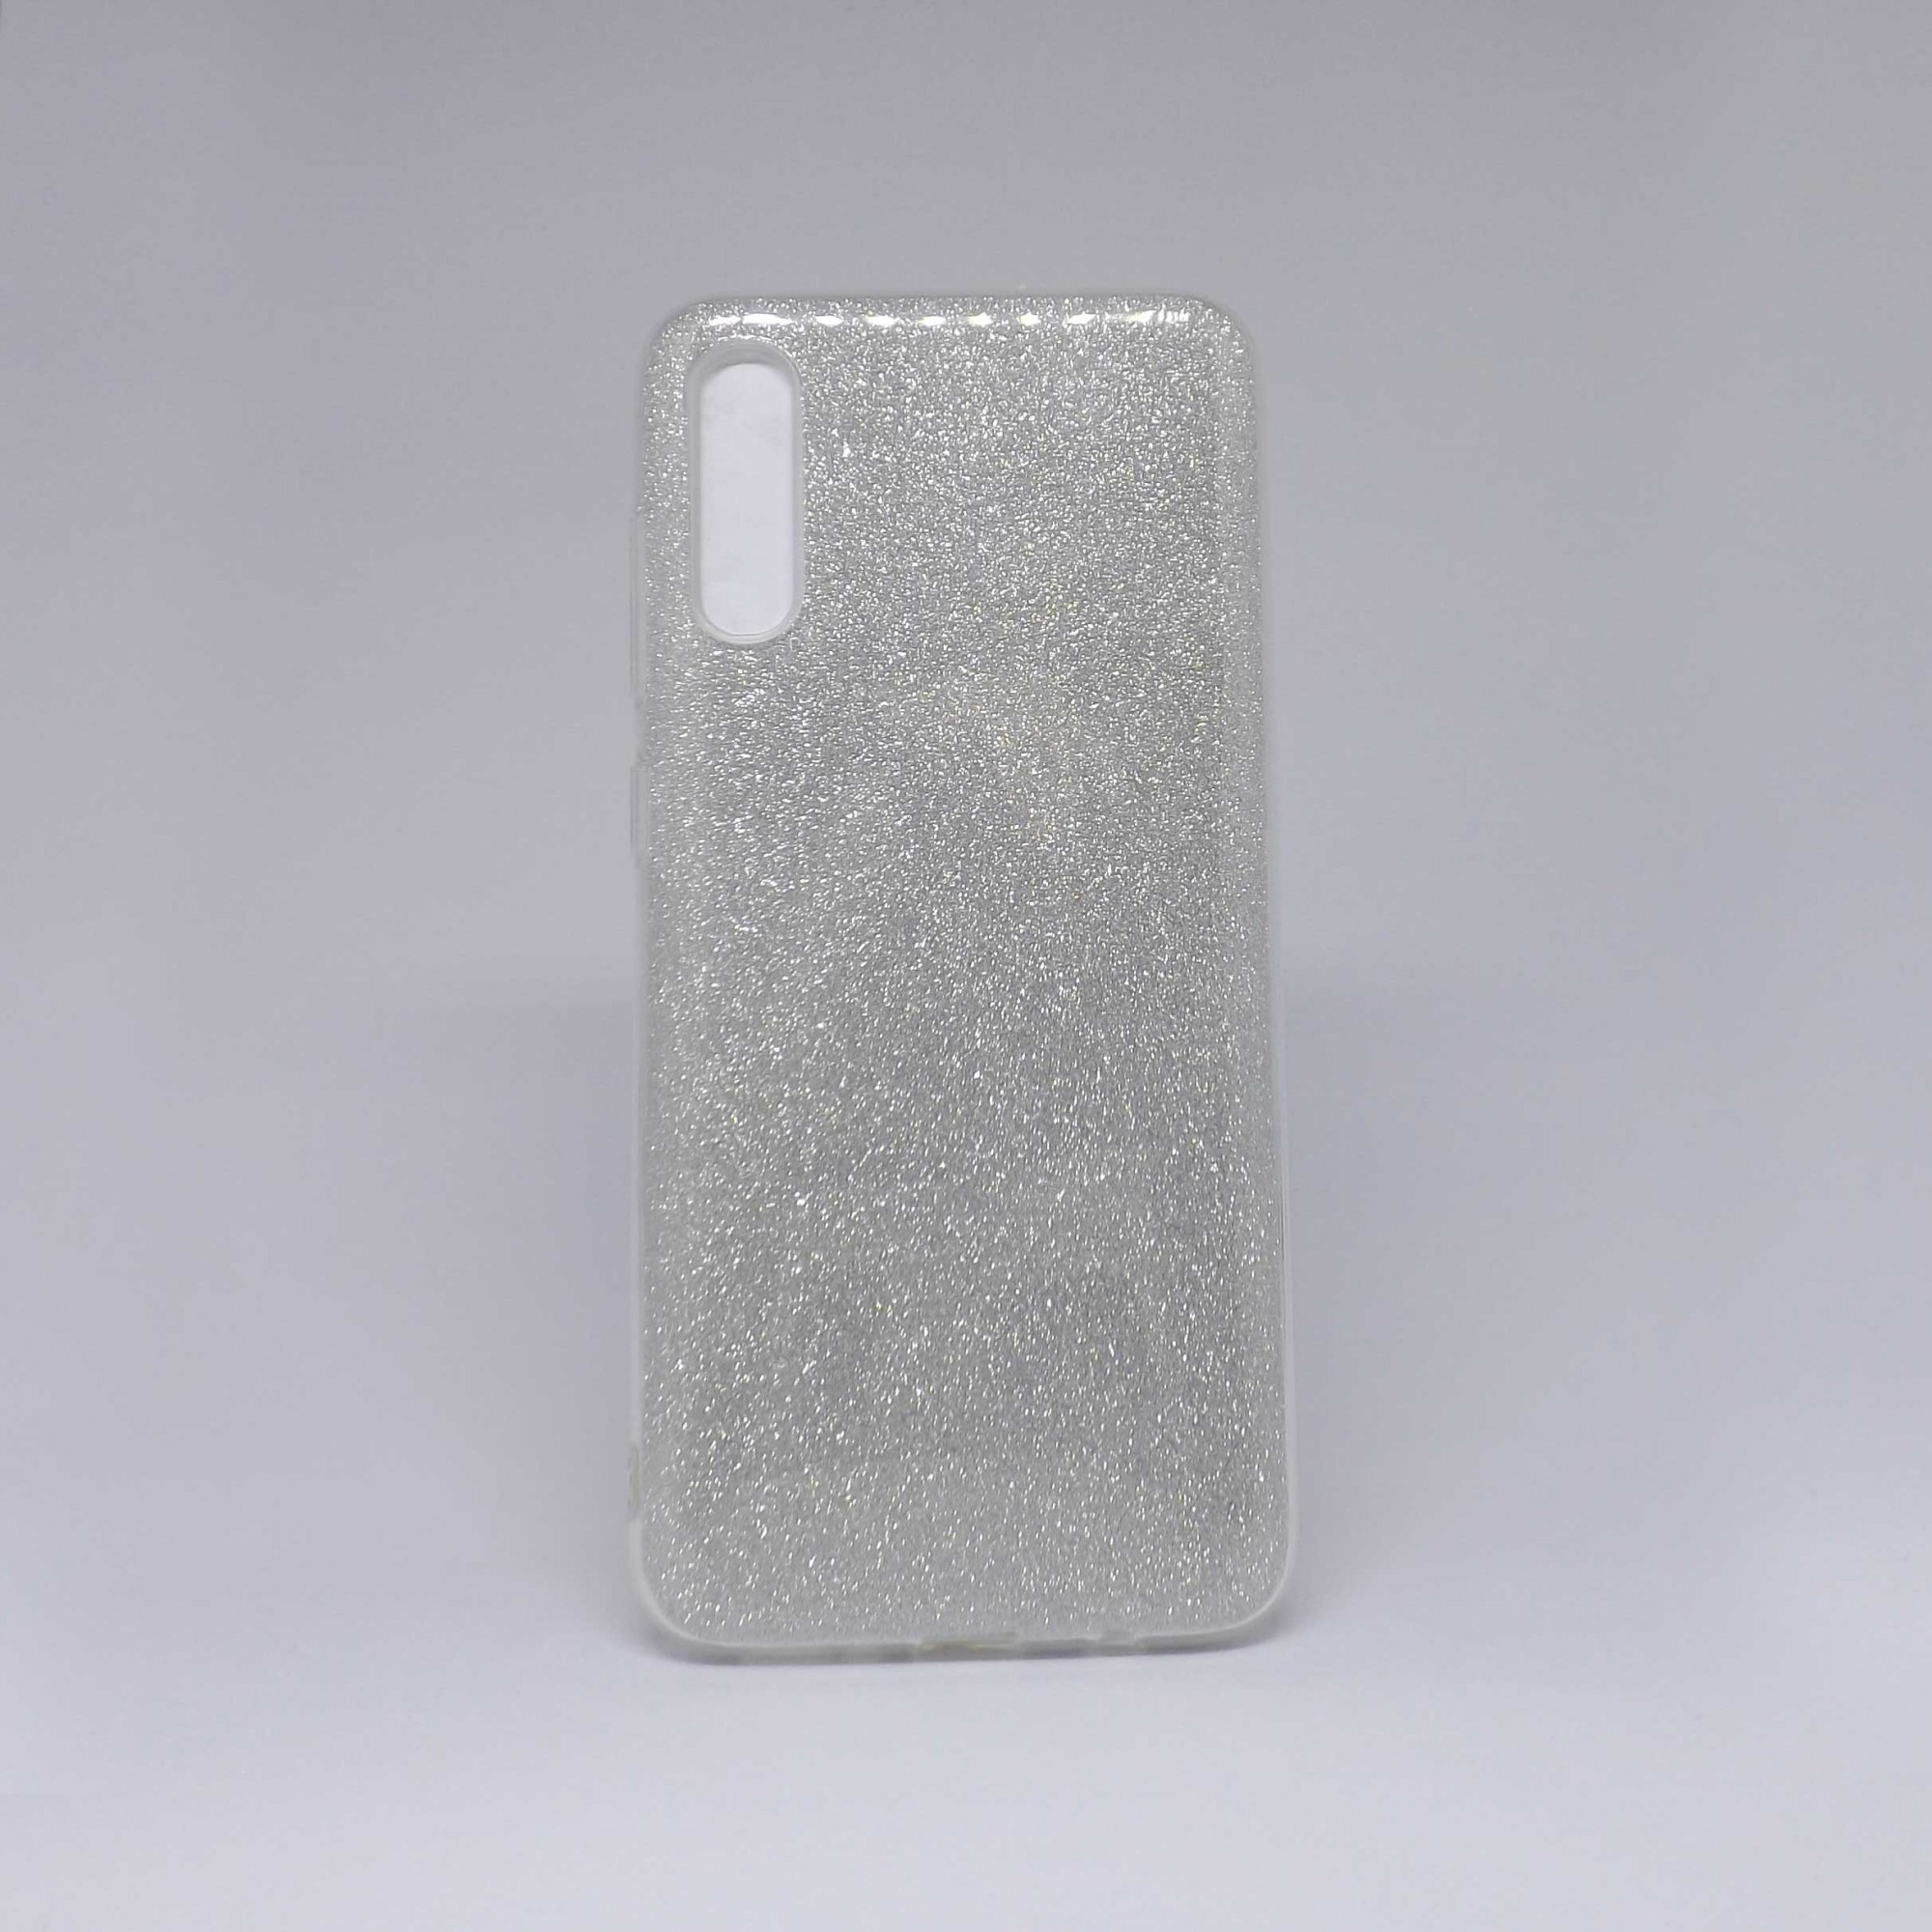 Capa Samsung Galaxy A70 Brilho